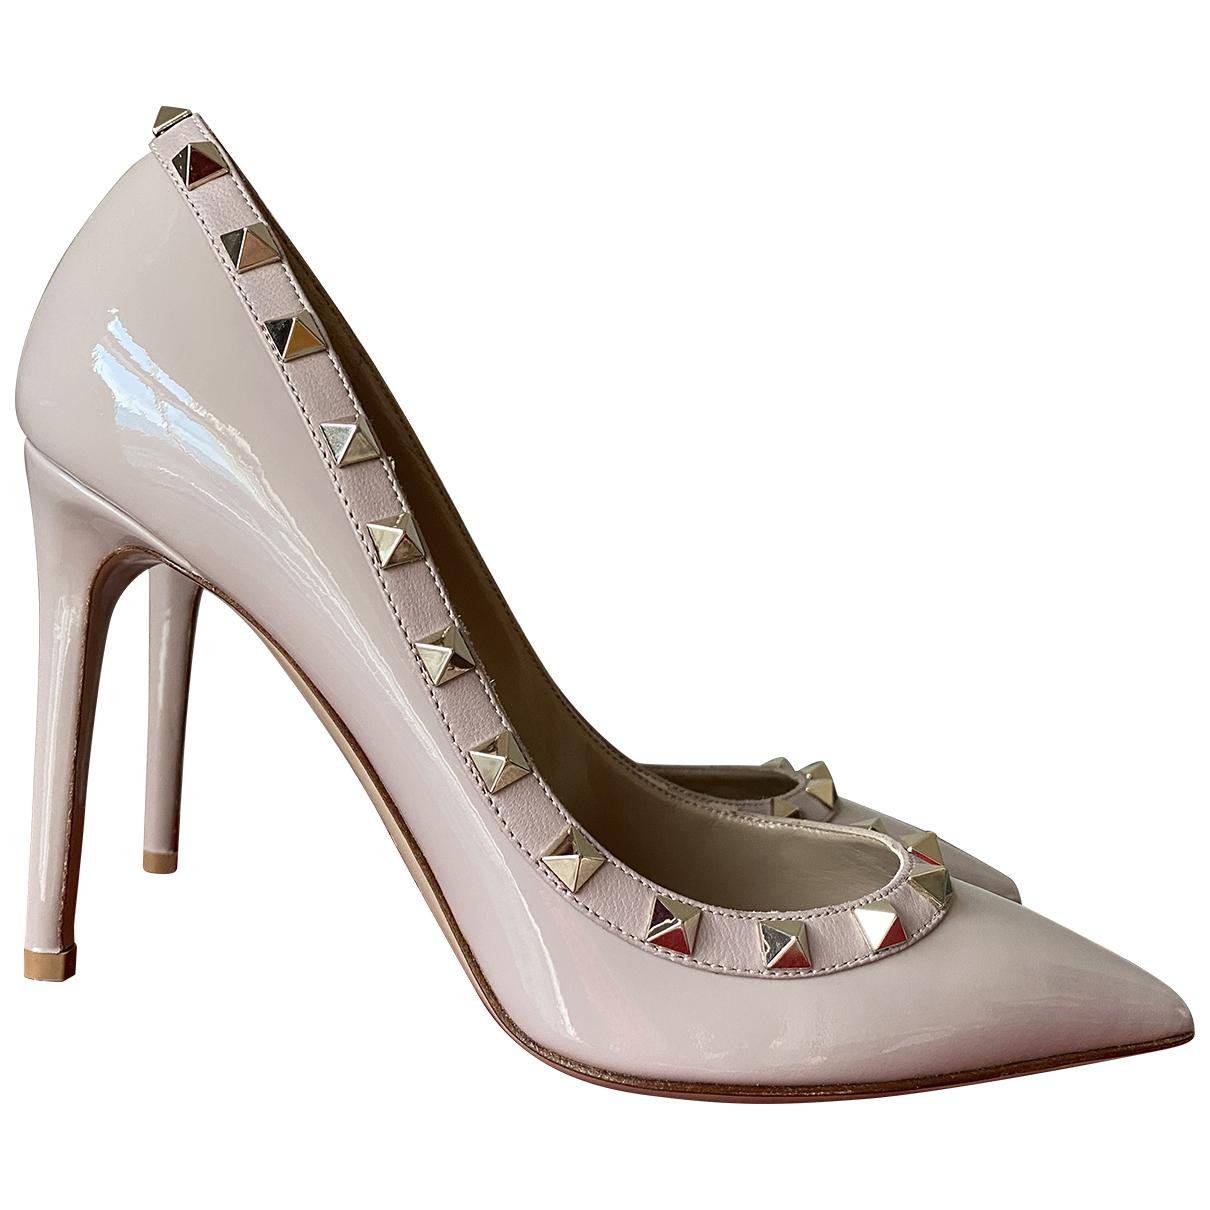 Valentino Garavani Rockstud Beige Patent leather Heels for Women 37 EU